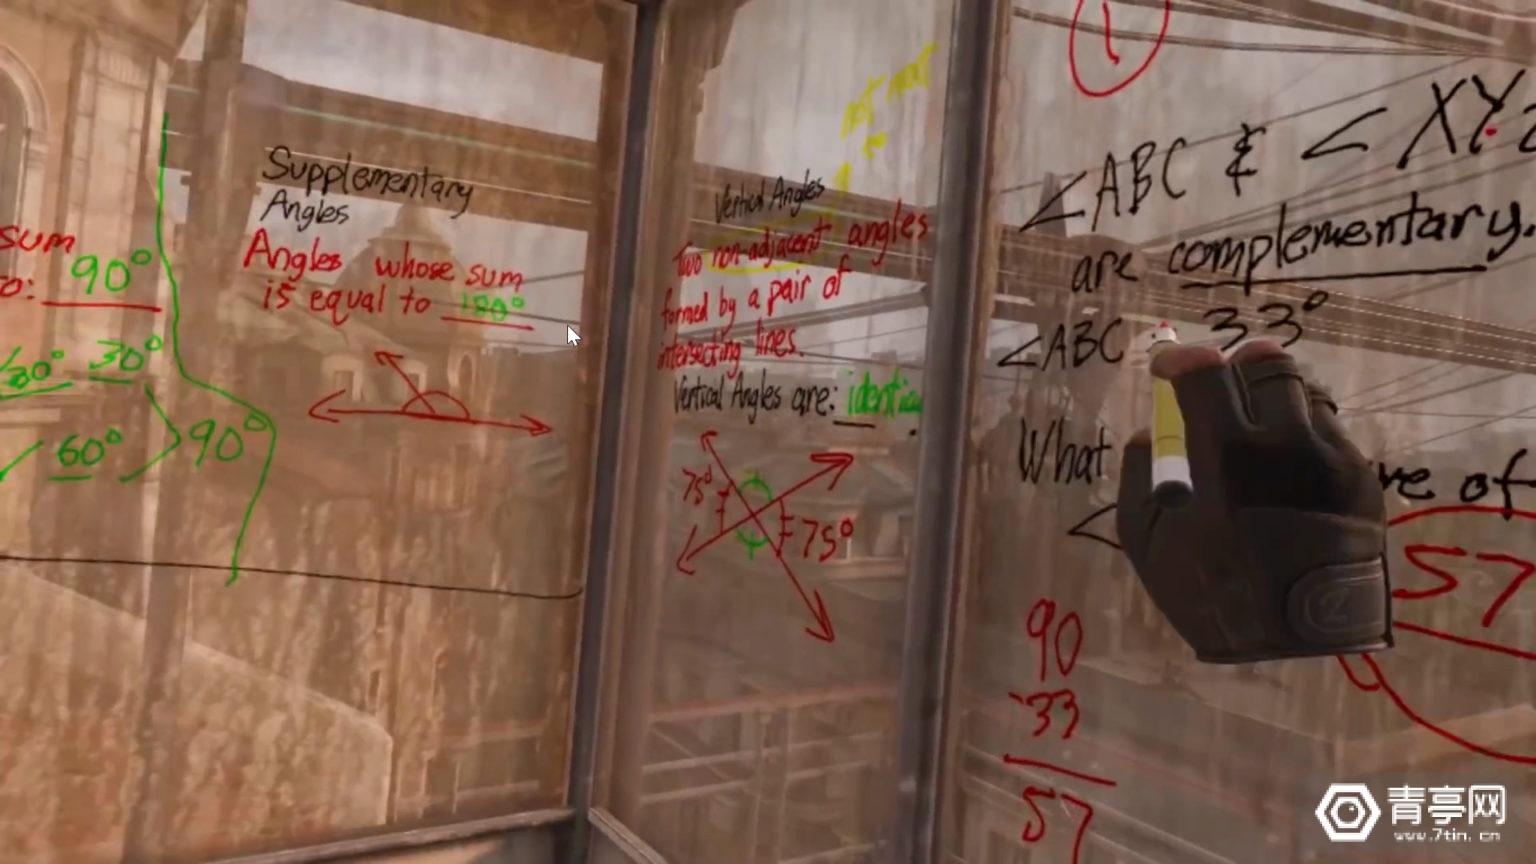 VR游戏《Half-Life:Alyx》内置最强虚拟白板,竟有老师用来讲课